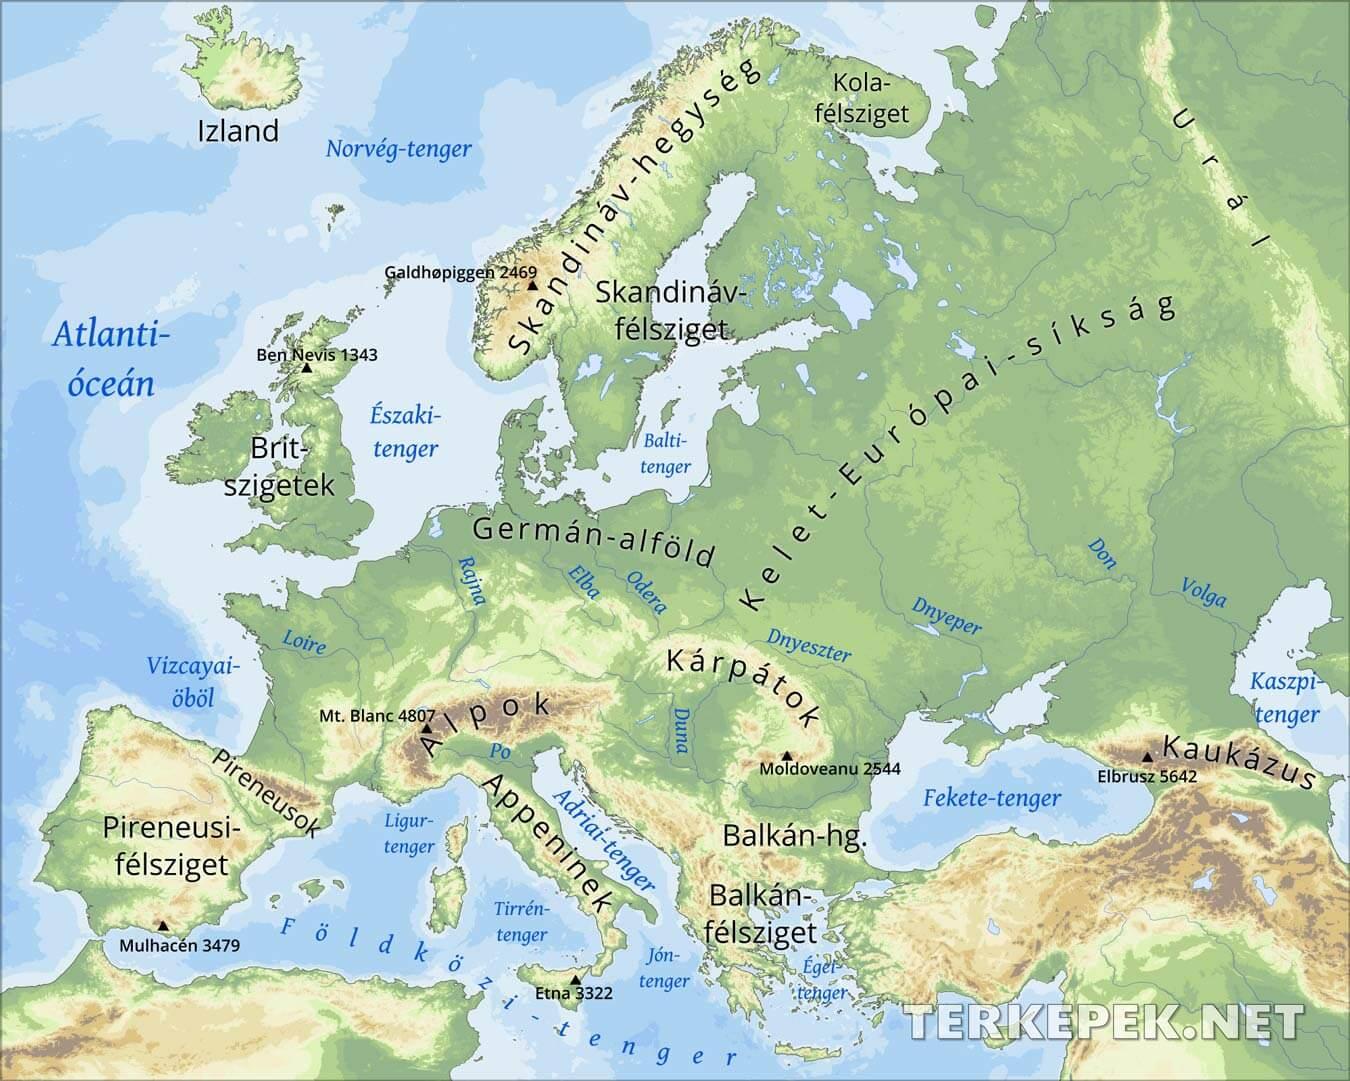 domborzati térkép európa Európa domborzati térképe domborzati térkép európa